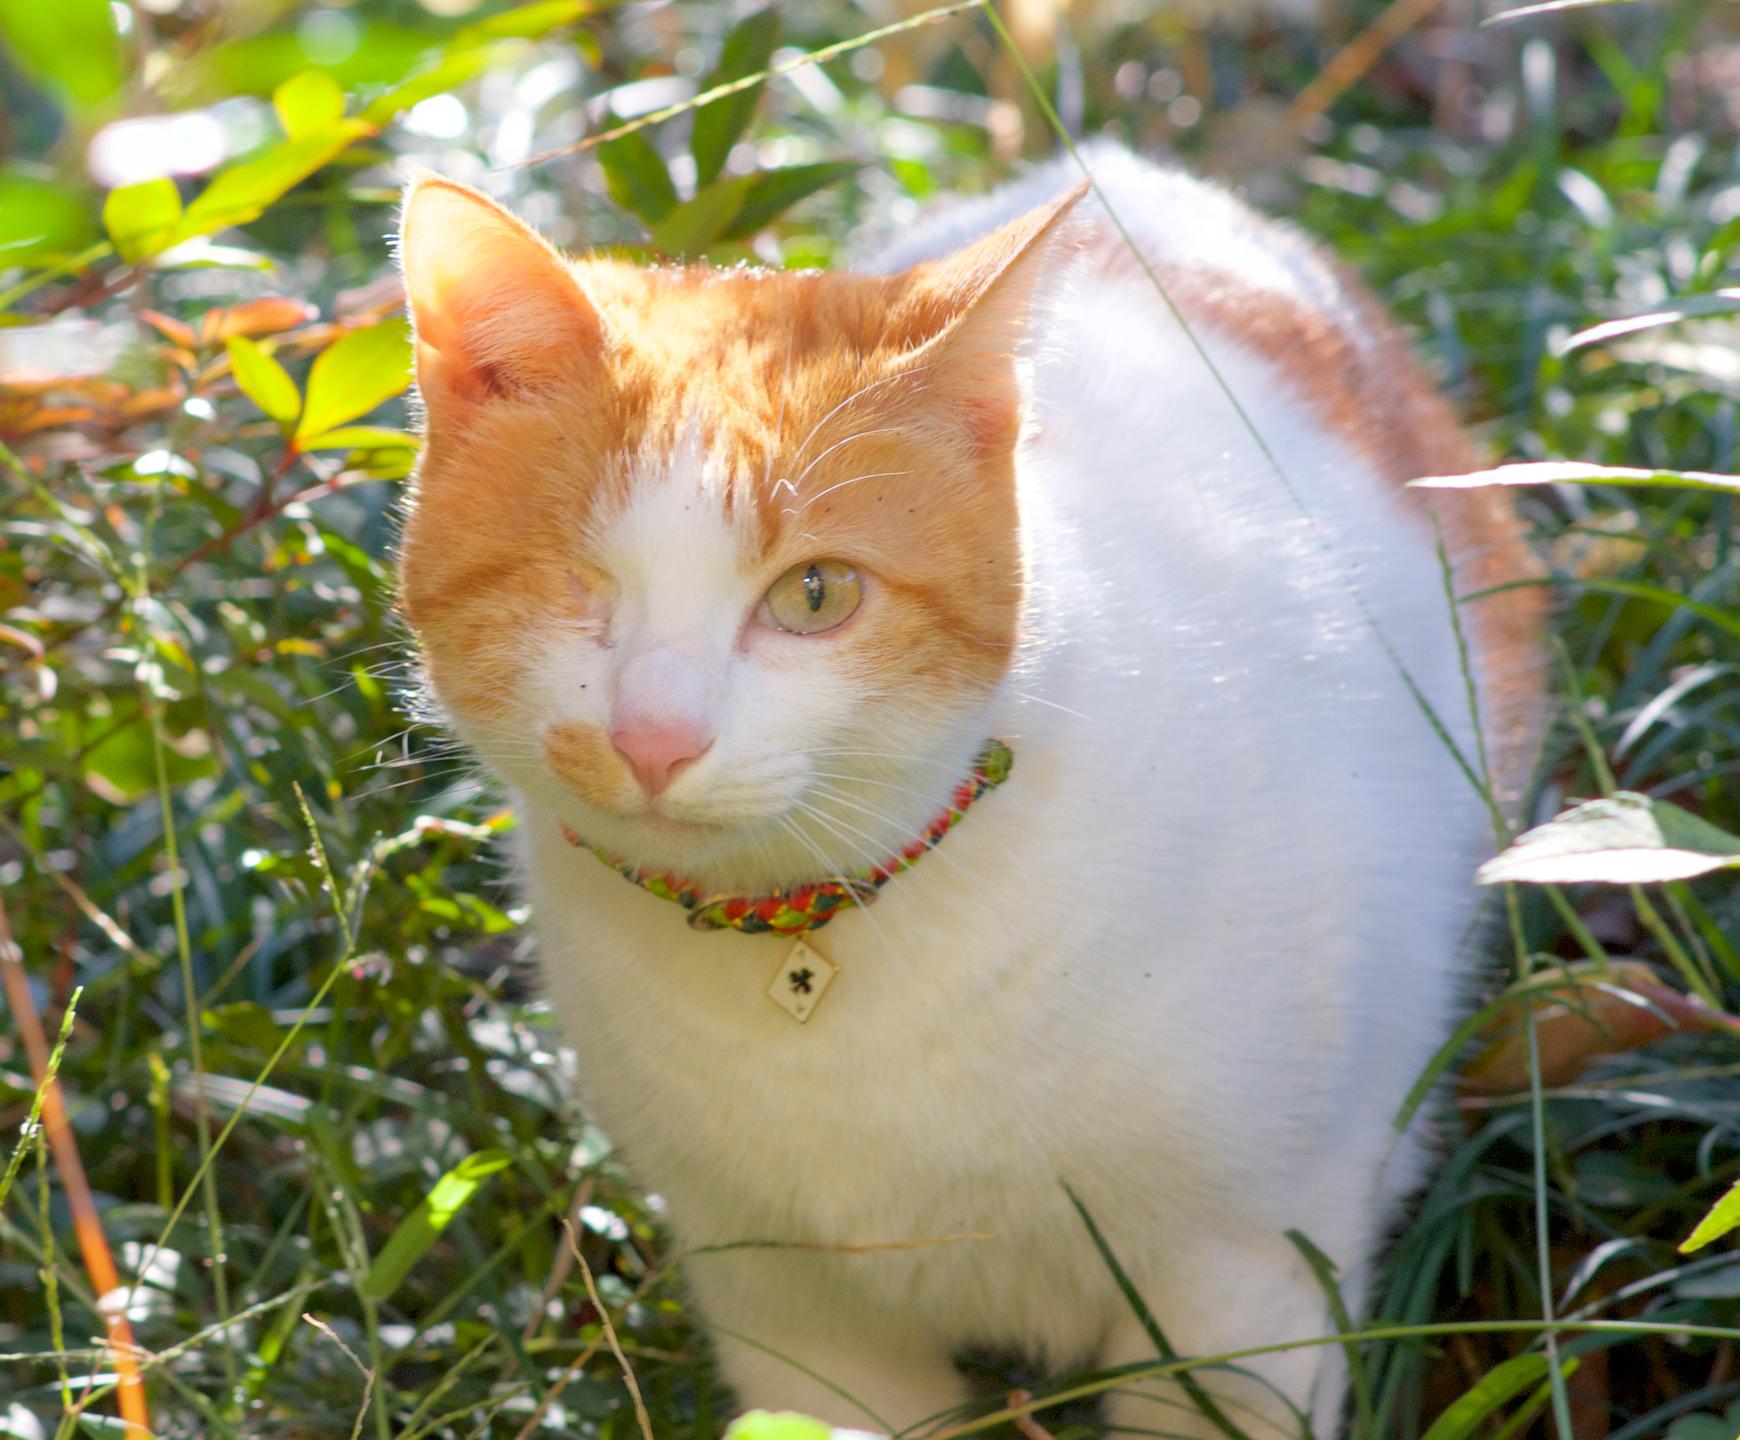 Tabby's Codeモデル猫 Kitaro